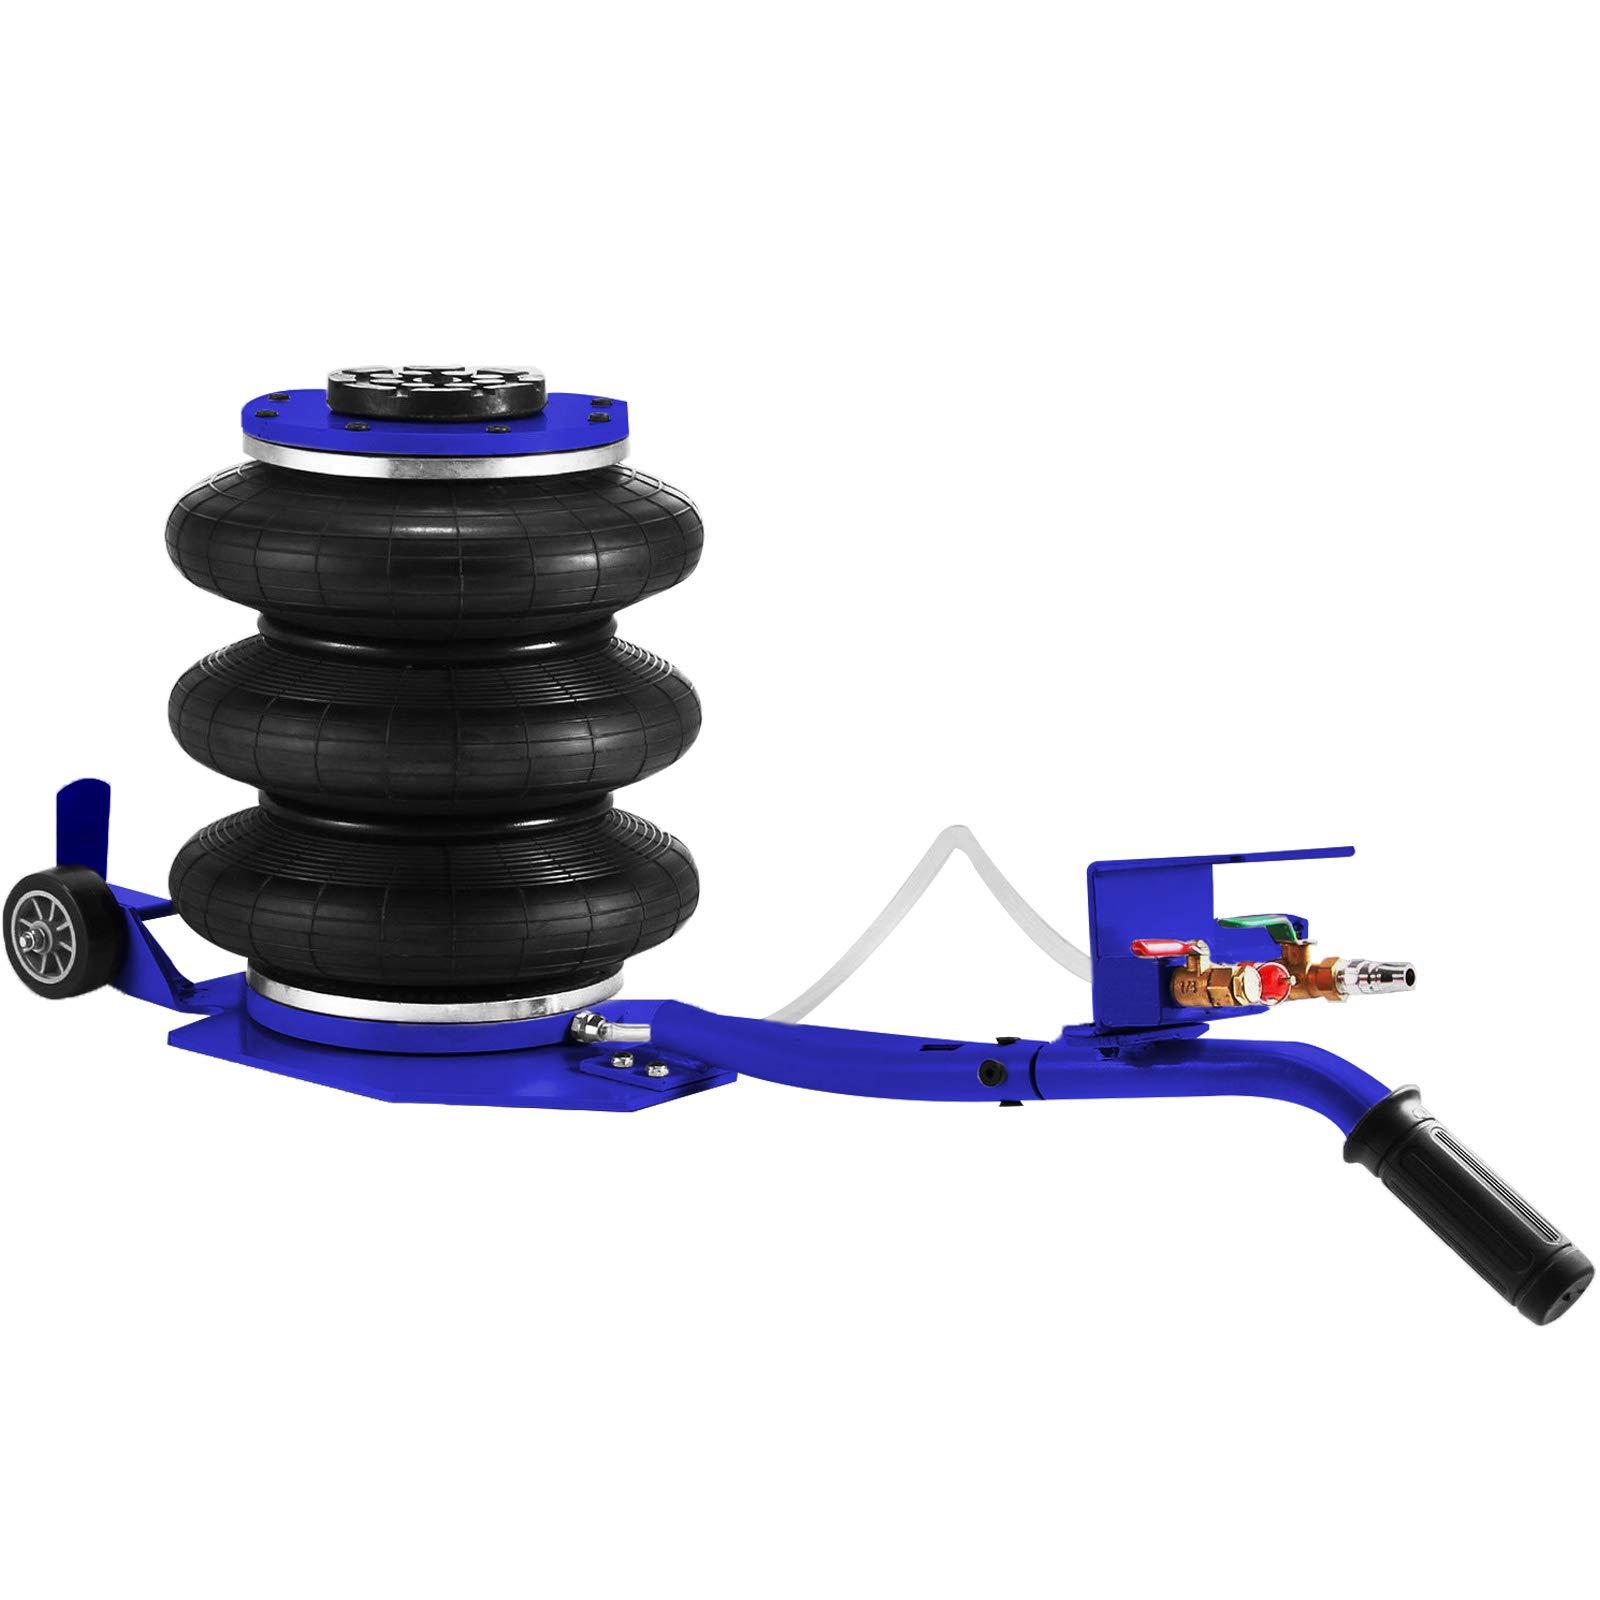 Mophorn Triple Bag Air Jack 6600lbs Pneumatic Jack 3 Ton Car Jack Lifting Up to 16 Inch Portable Repair(Blue)